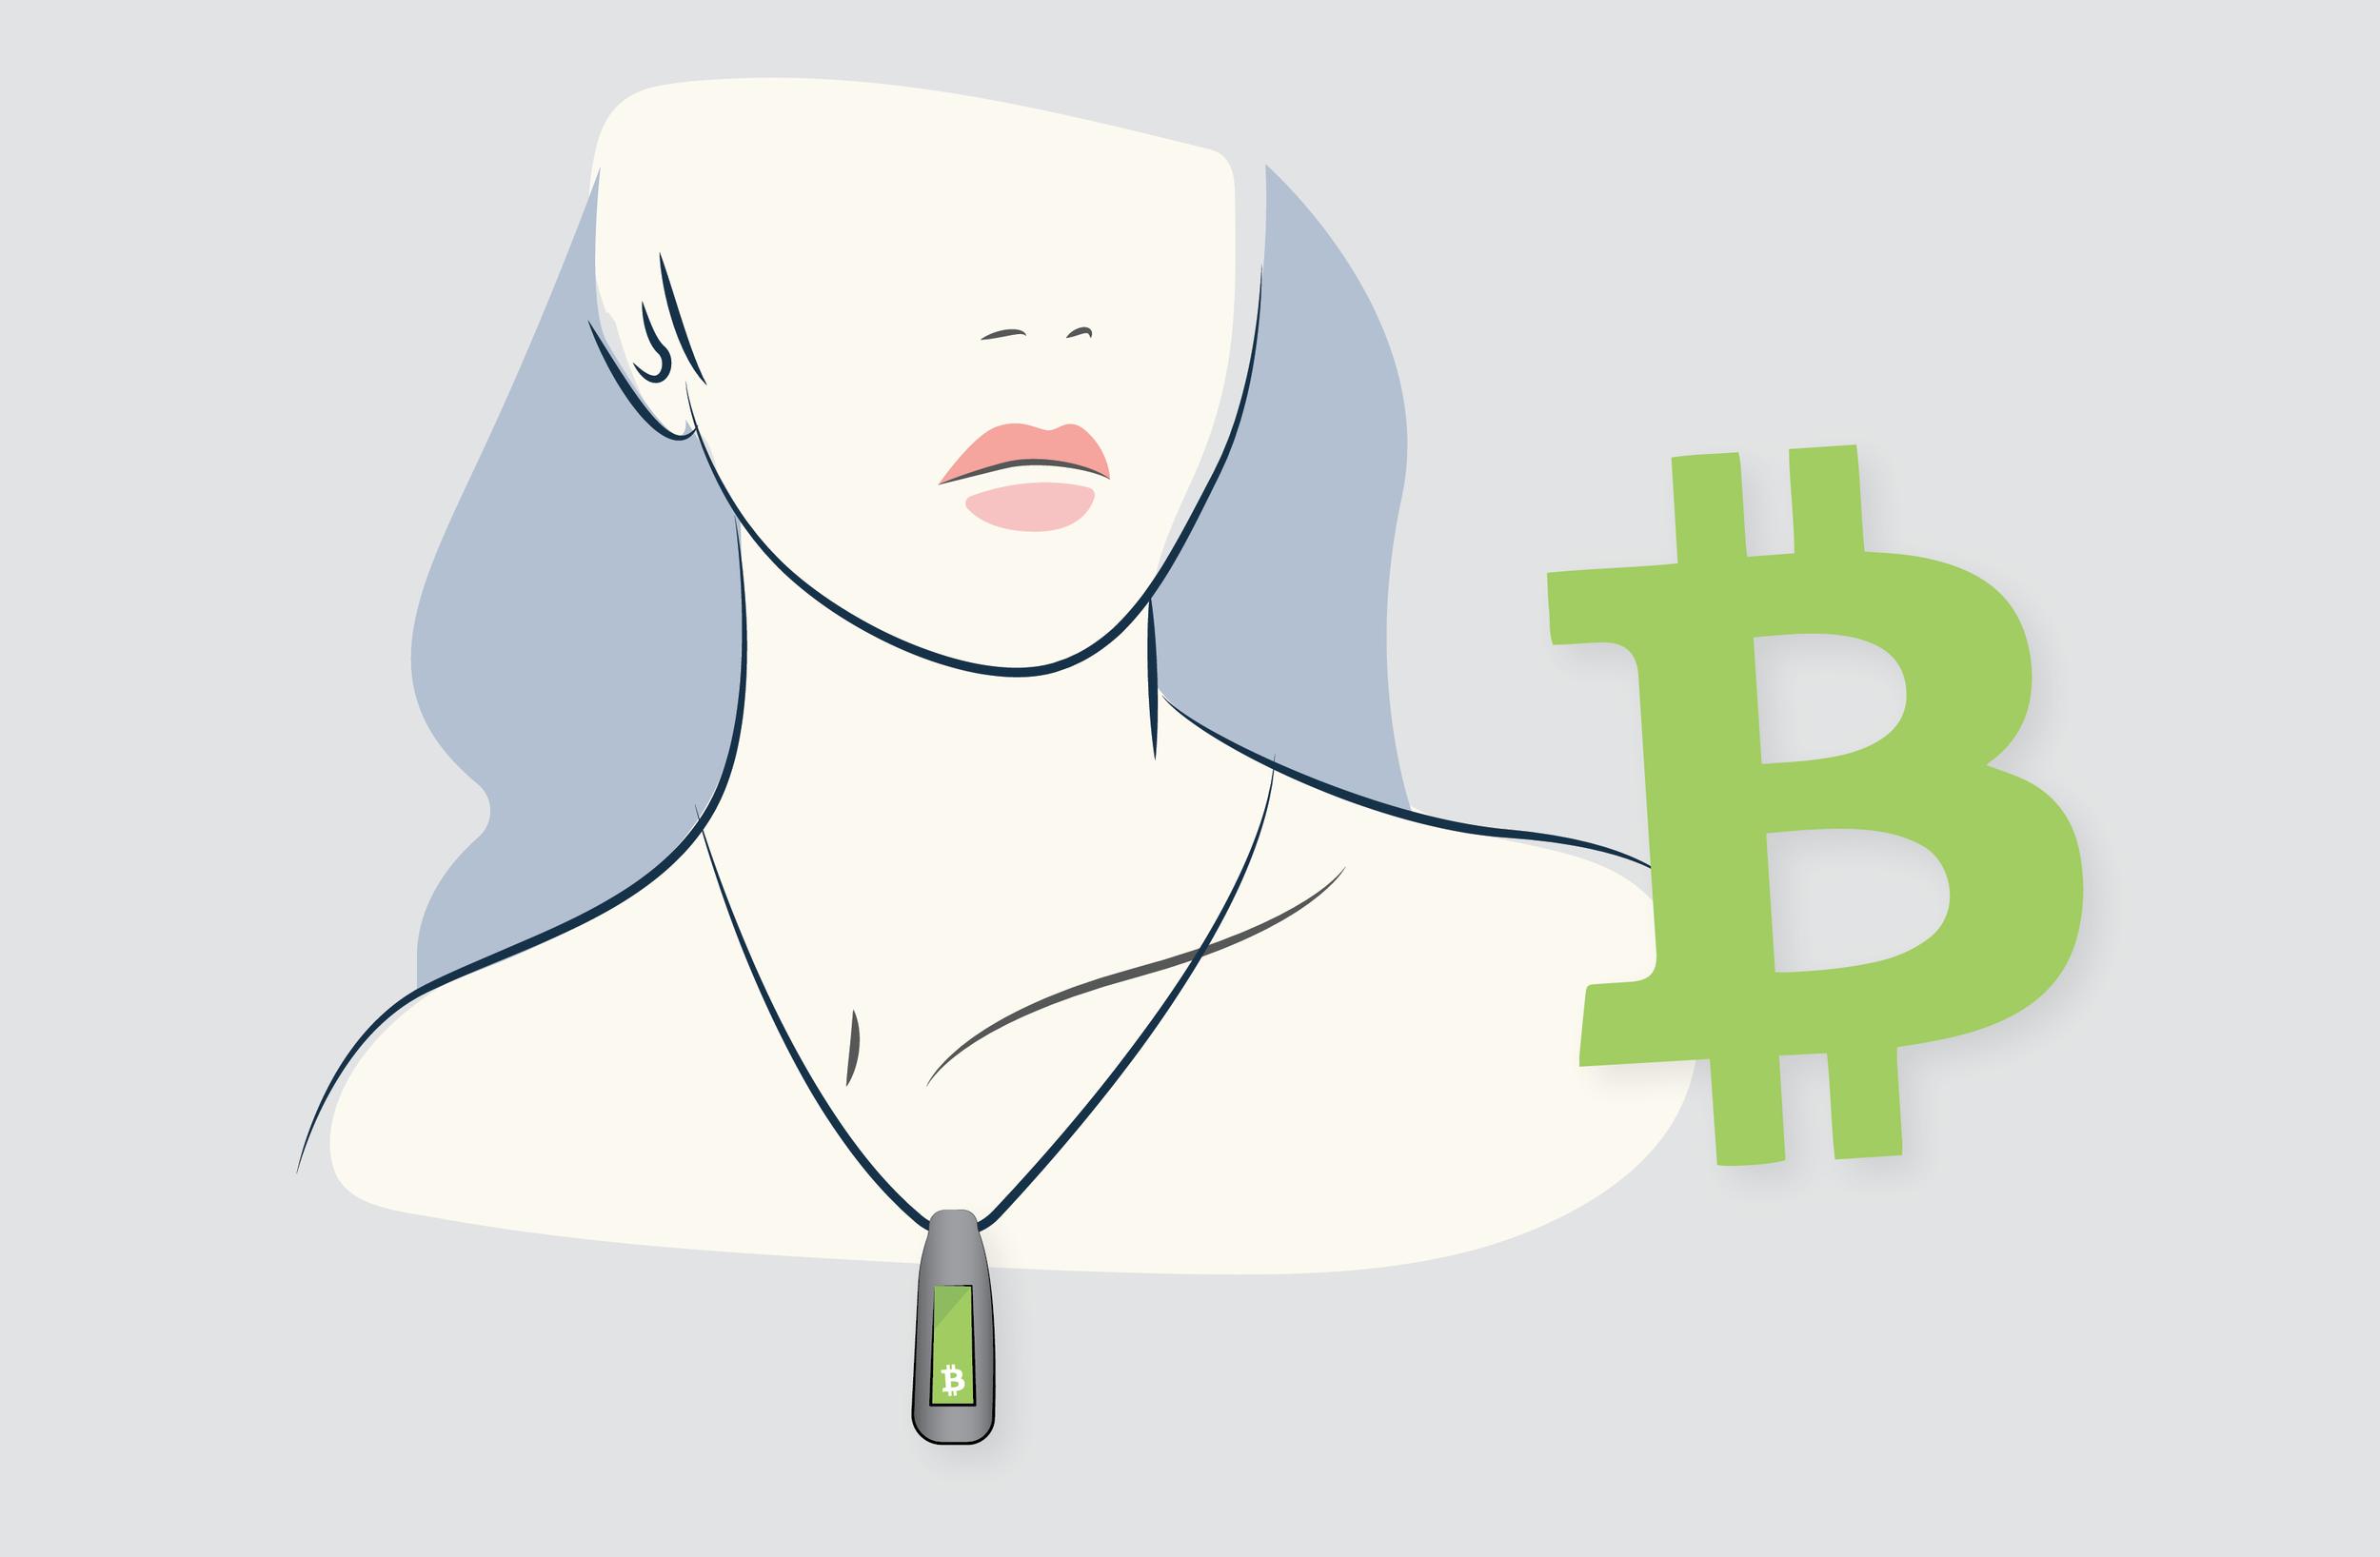 Bitcoin Jewelry? Coming Soon Anyone?